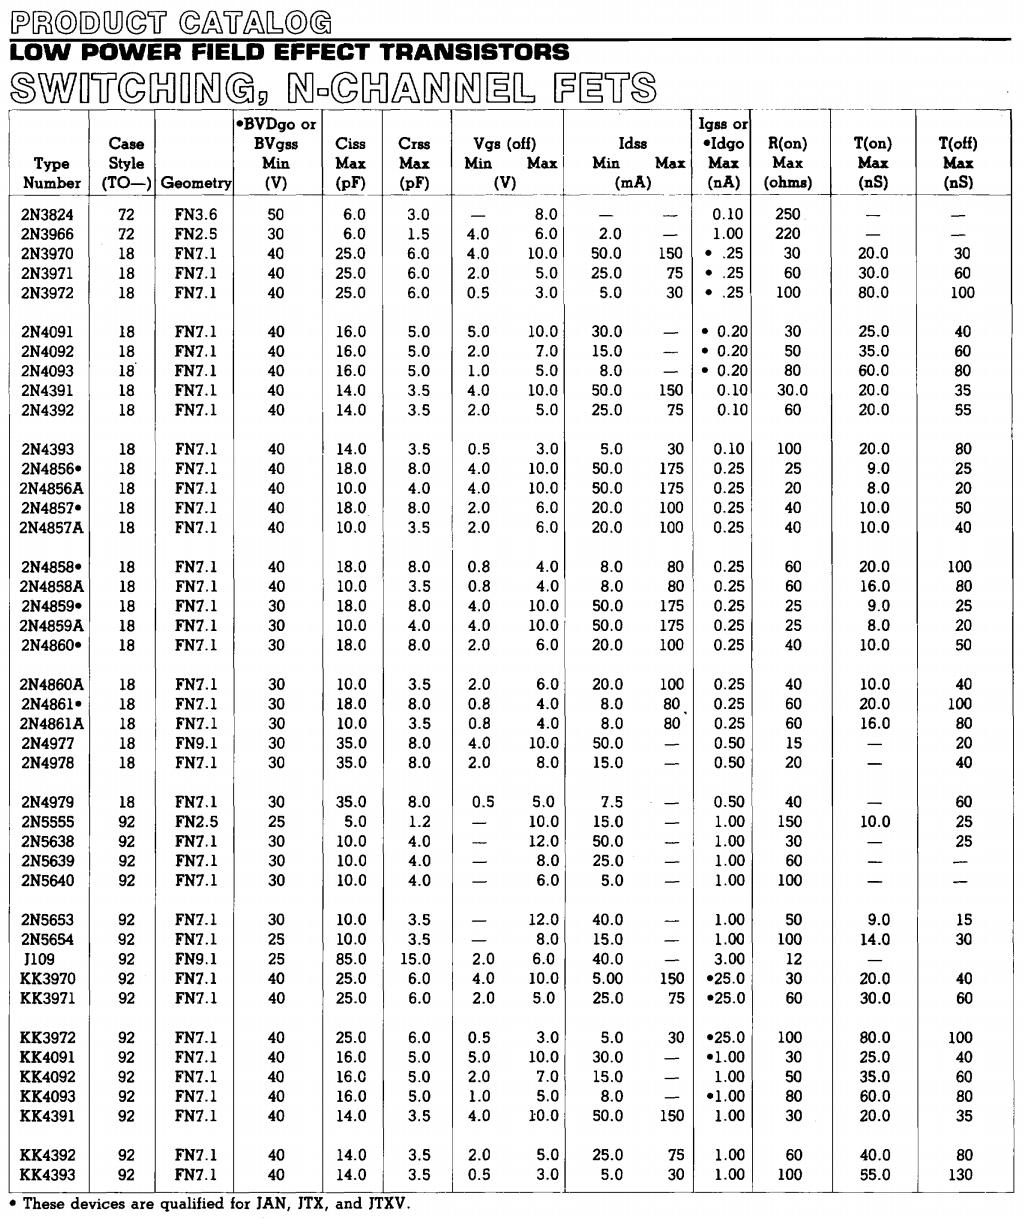 2N3966